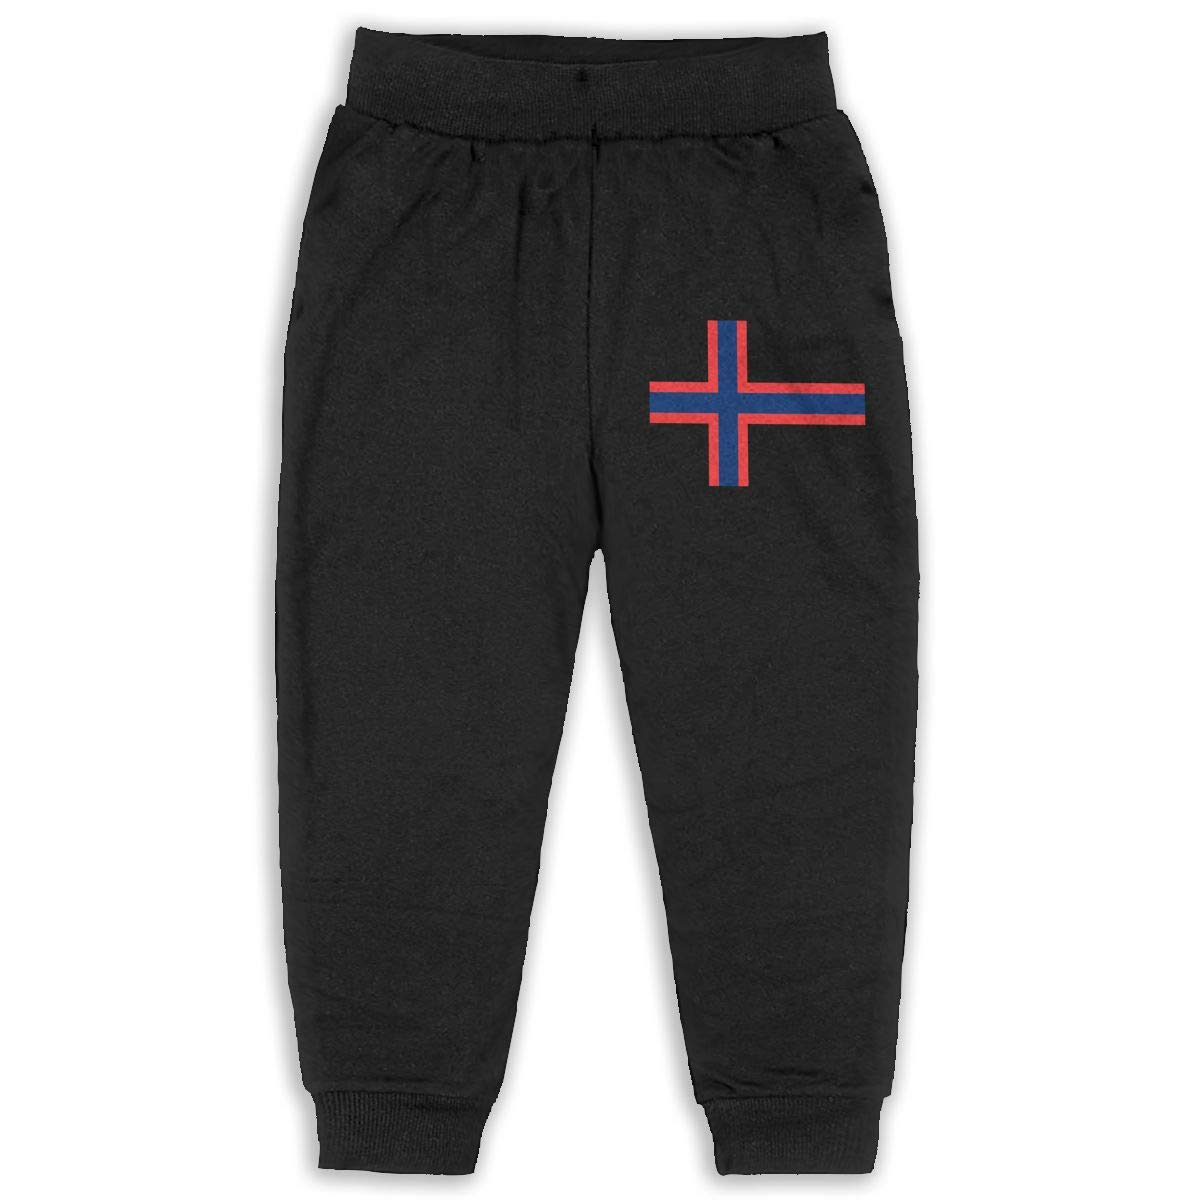 EASON-G Kids Joggers Norwegian Flag Fashion Sweatpants 2T 6T